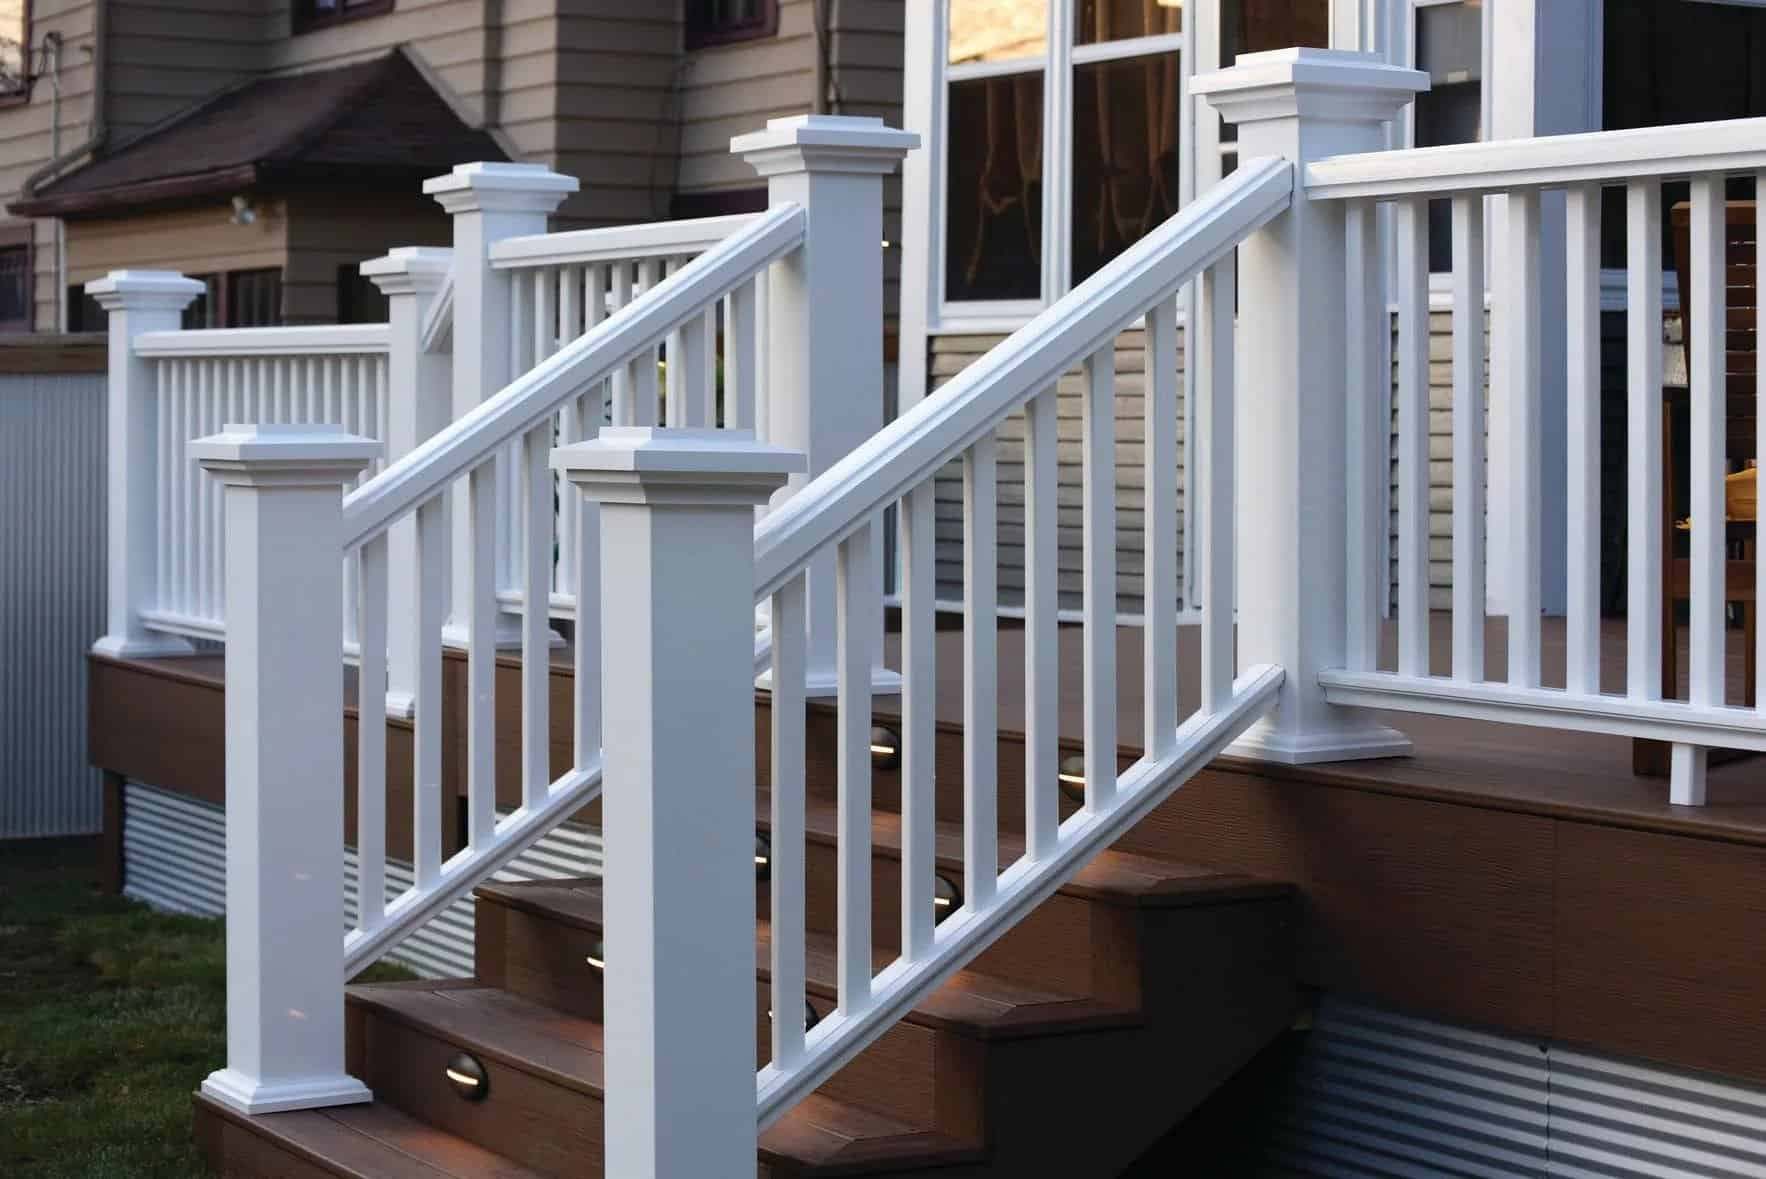 How To Install Timbertech Deck Railing Timbertech   Exterior Stair Railings Near Me   Stair Treads   Porch   Front Porch   Porch Railing   Railing Ideas